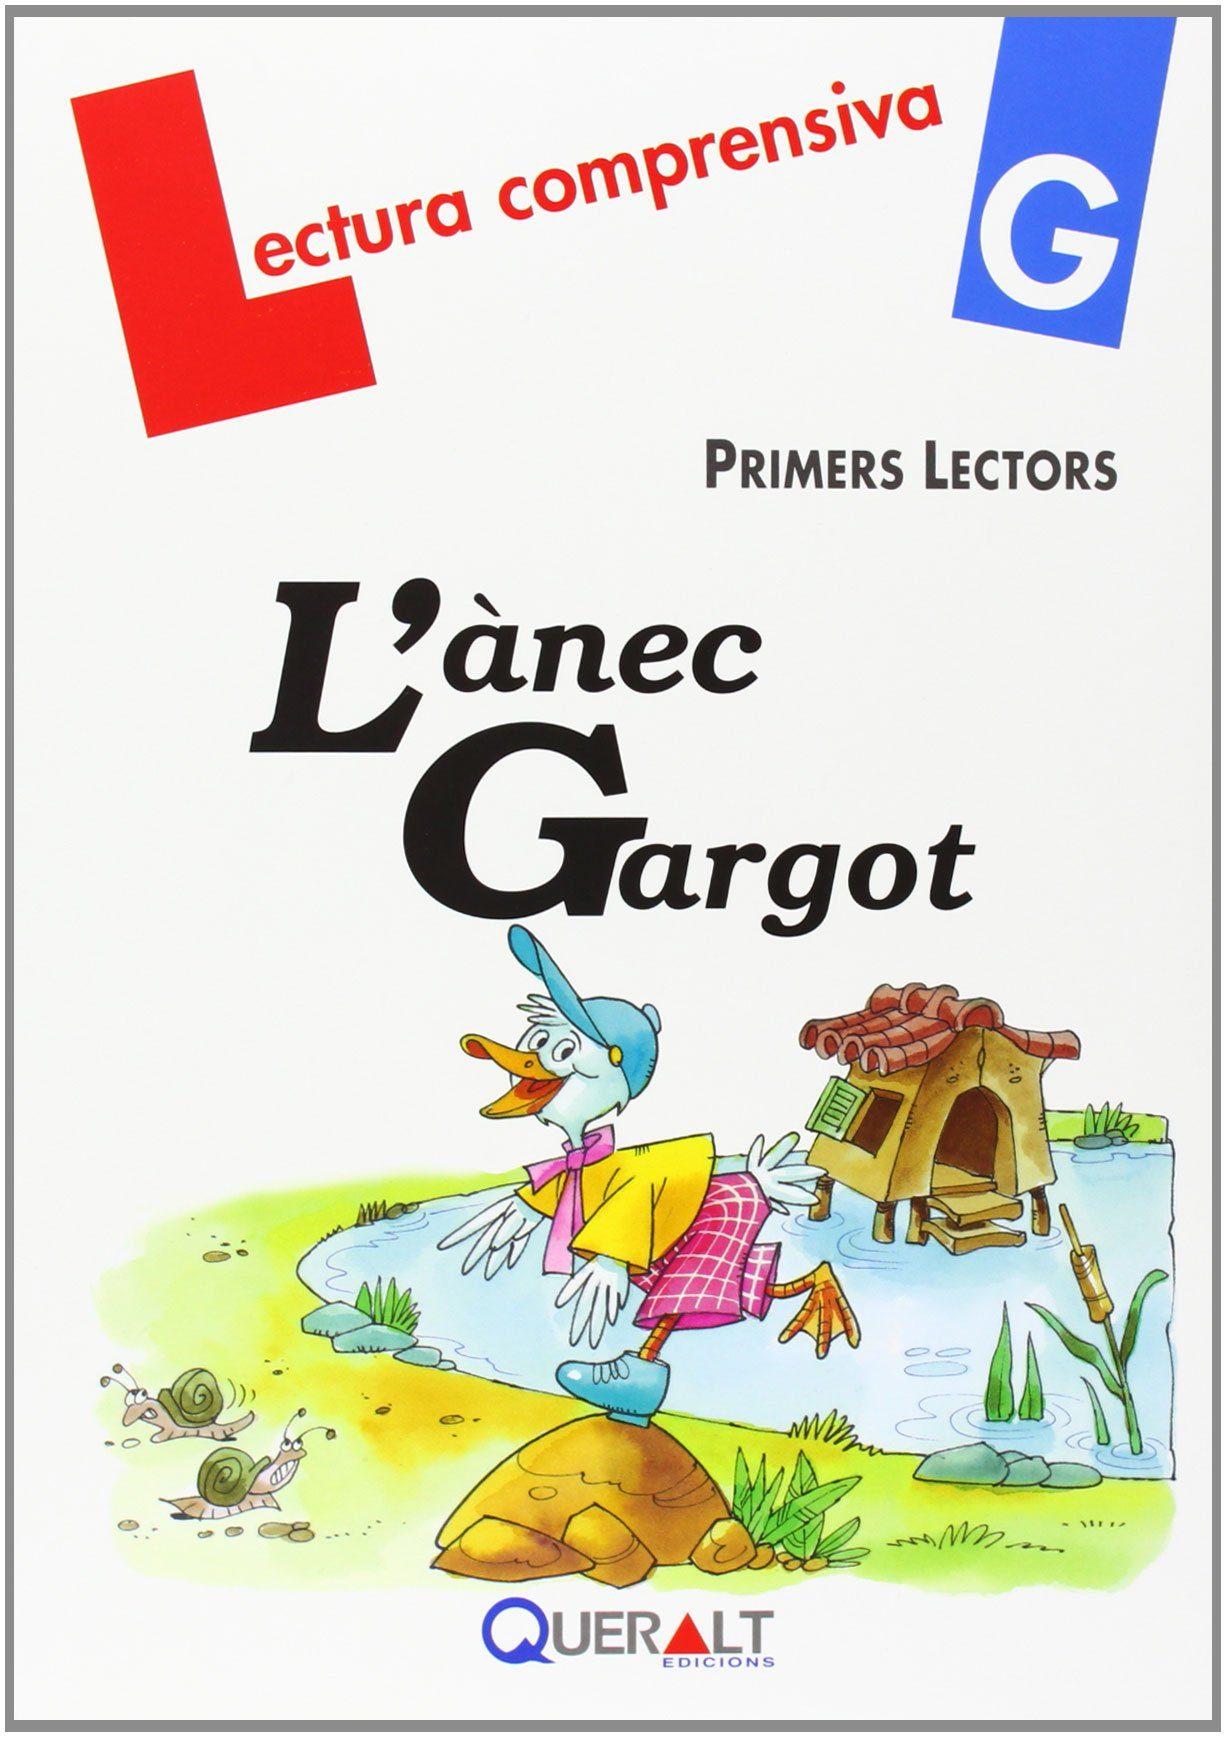 Ànec Gargot - Quadern G por Merce/lena Pla Viana epub